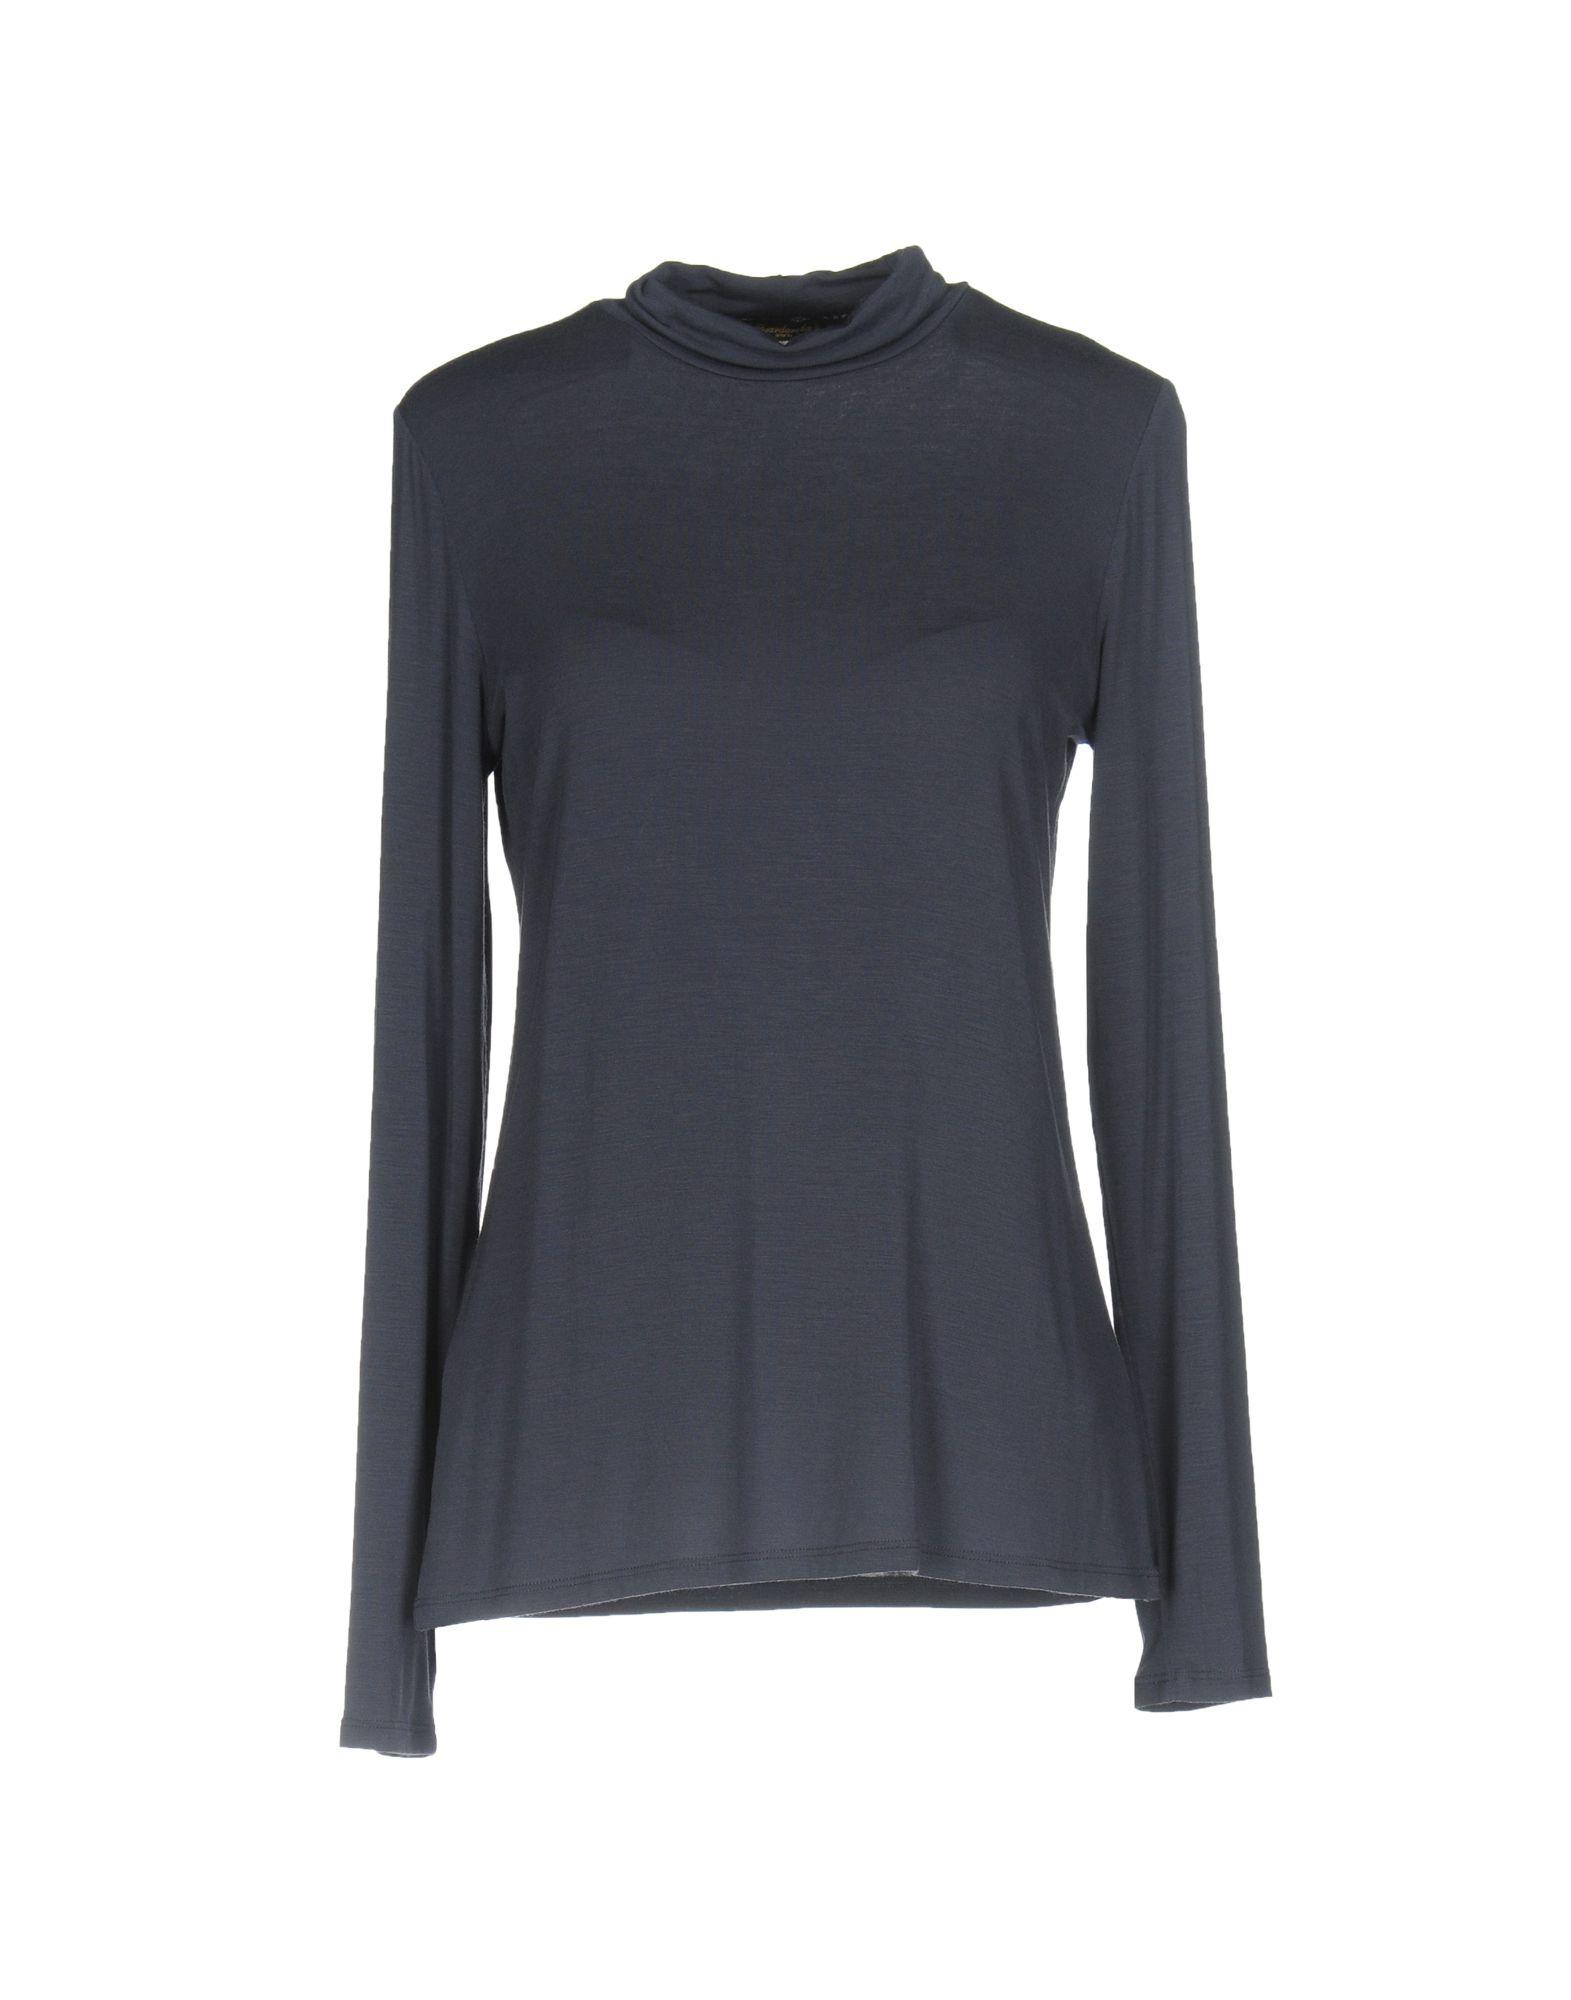 GUARDAROBA by ANIYE BY Damen T-shirts Farbe Taubenblau Größe 6